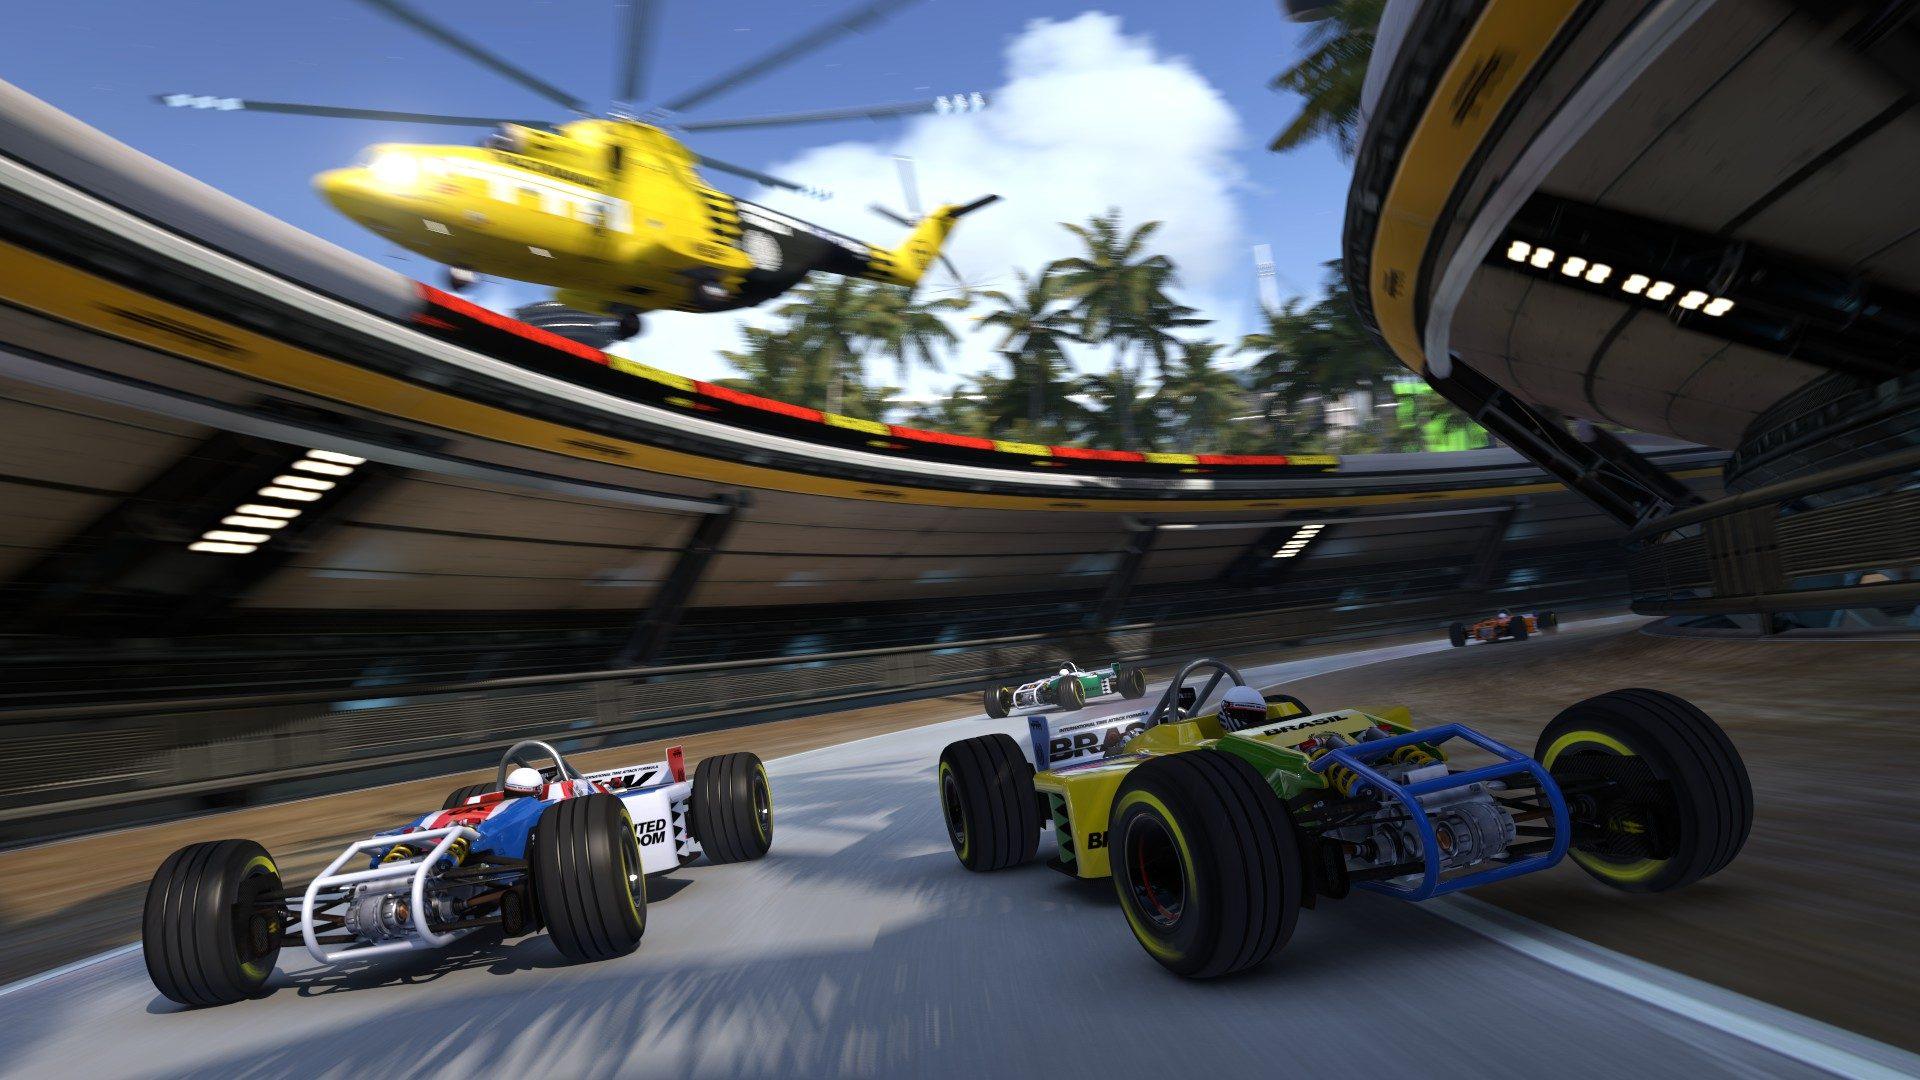 Trackmania Turbo image 8